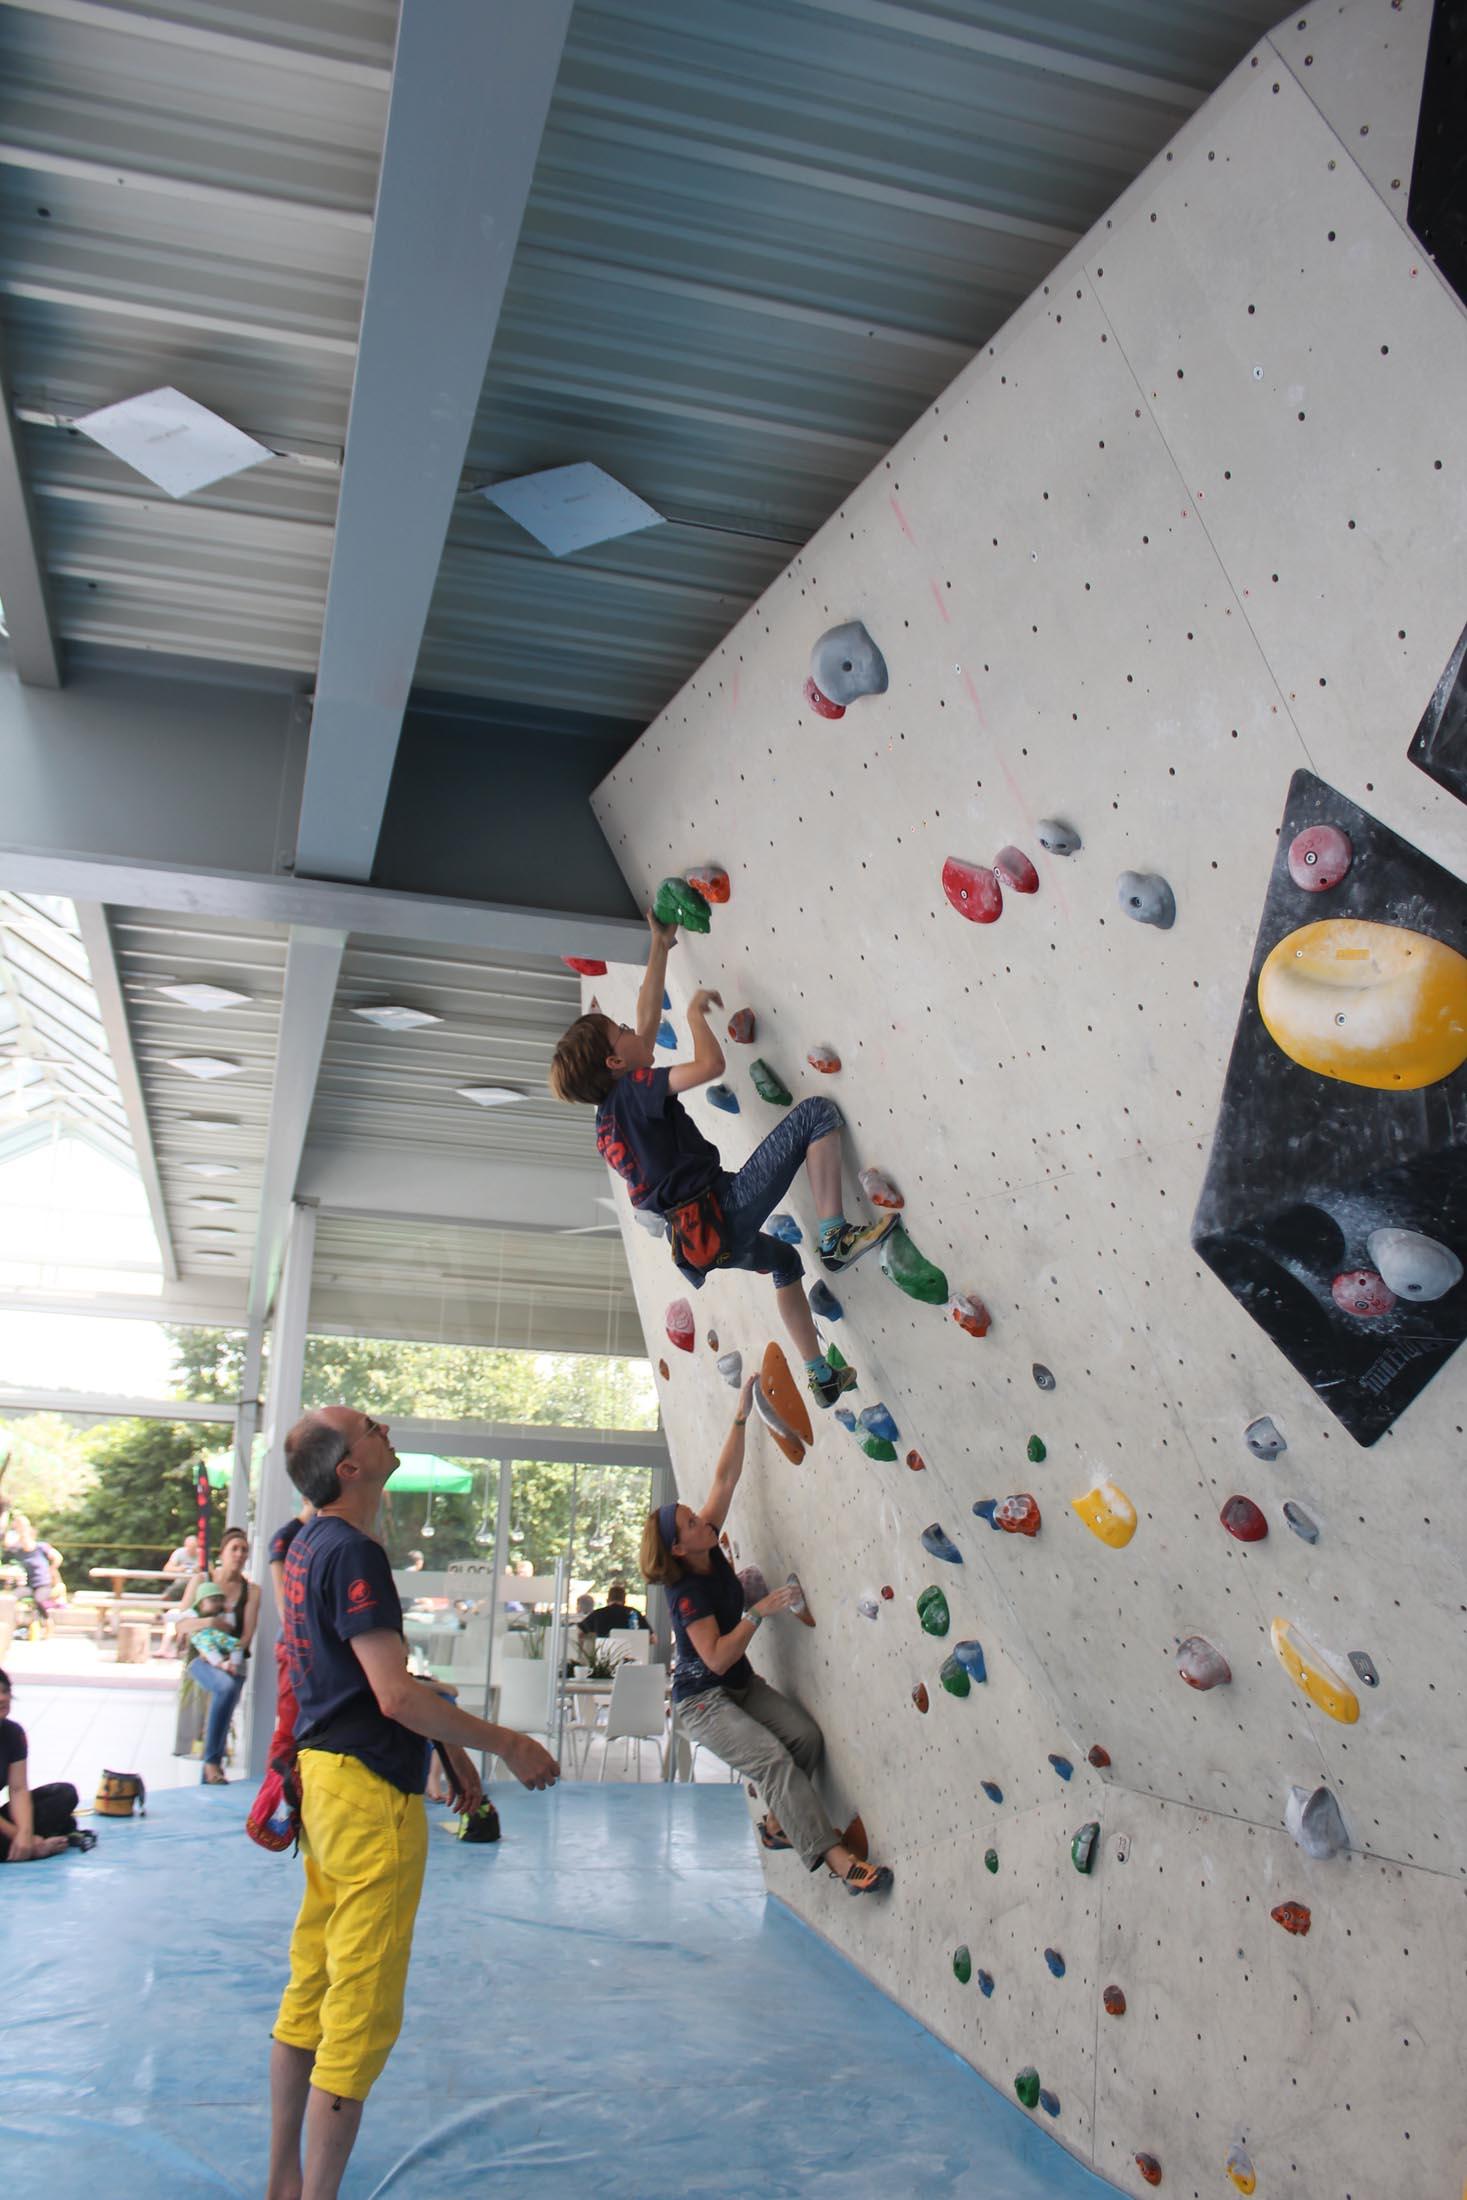 Quali, internationaler bouldercup Frankenjura 2016, BLOCKHELDEN Erlangen, Mammut, Bergfreunde.de, Boulderwettkampf07092016246